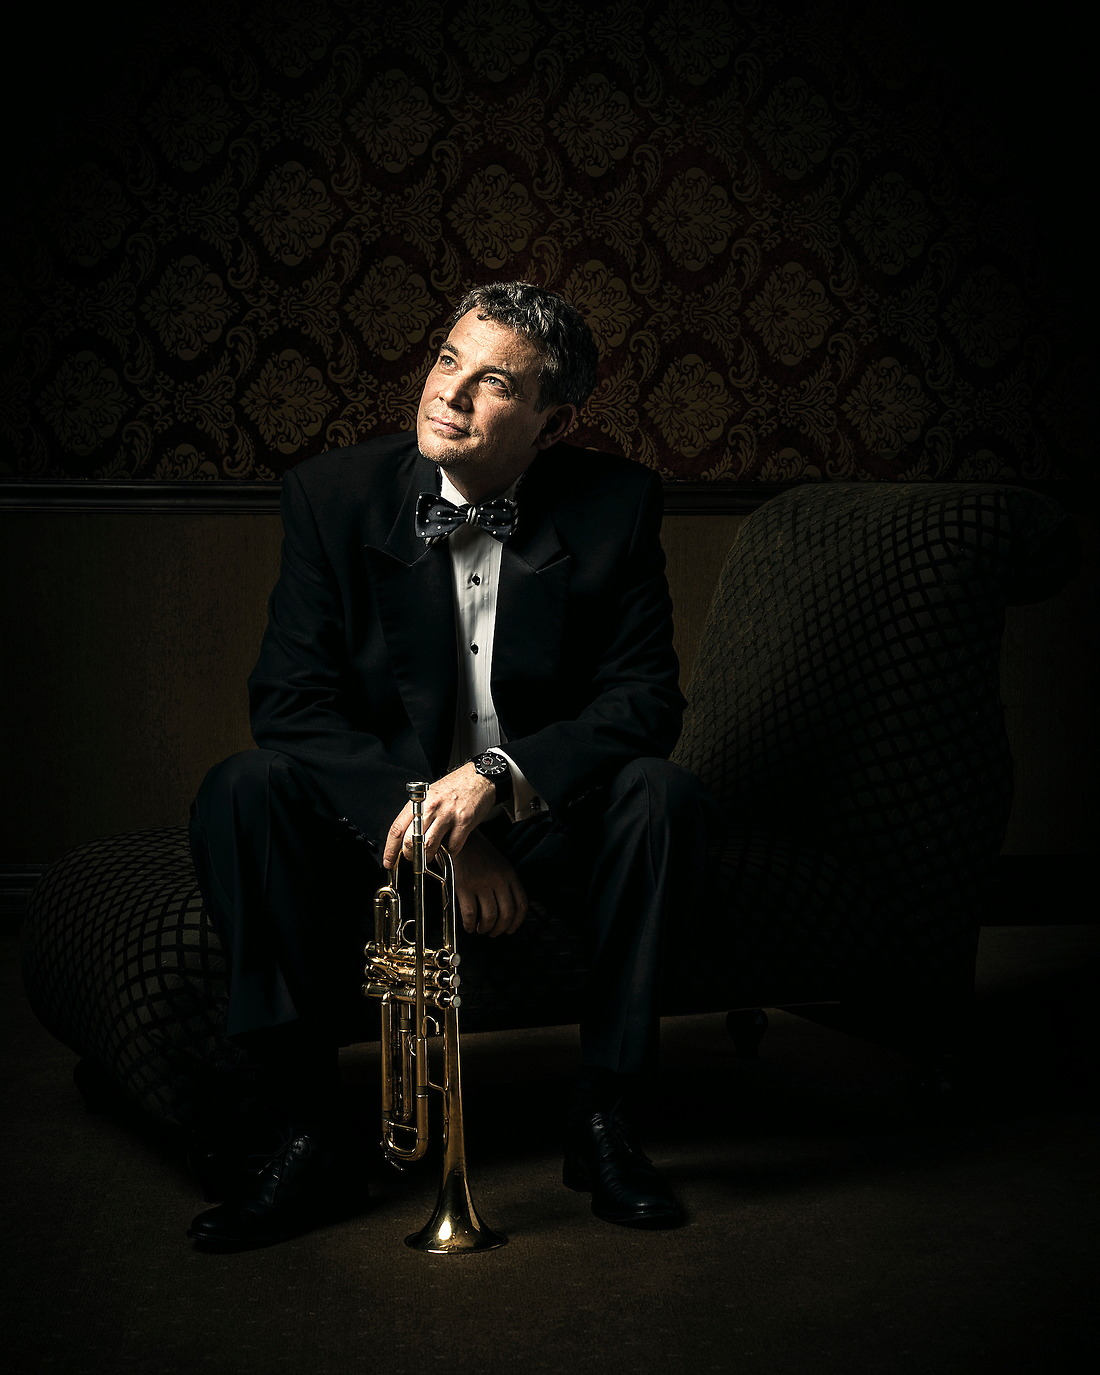 Ryan Anthony Principal Trumpet, Dallas Symphony Orchestra, former member Canadian Brass and International Trumpet Soloist. — © Jeremy Lock/